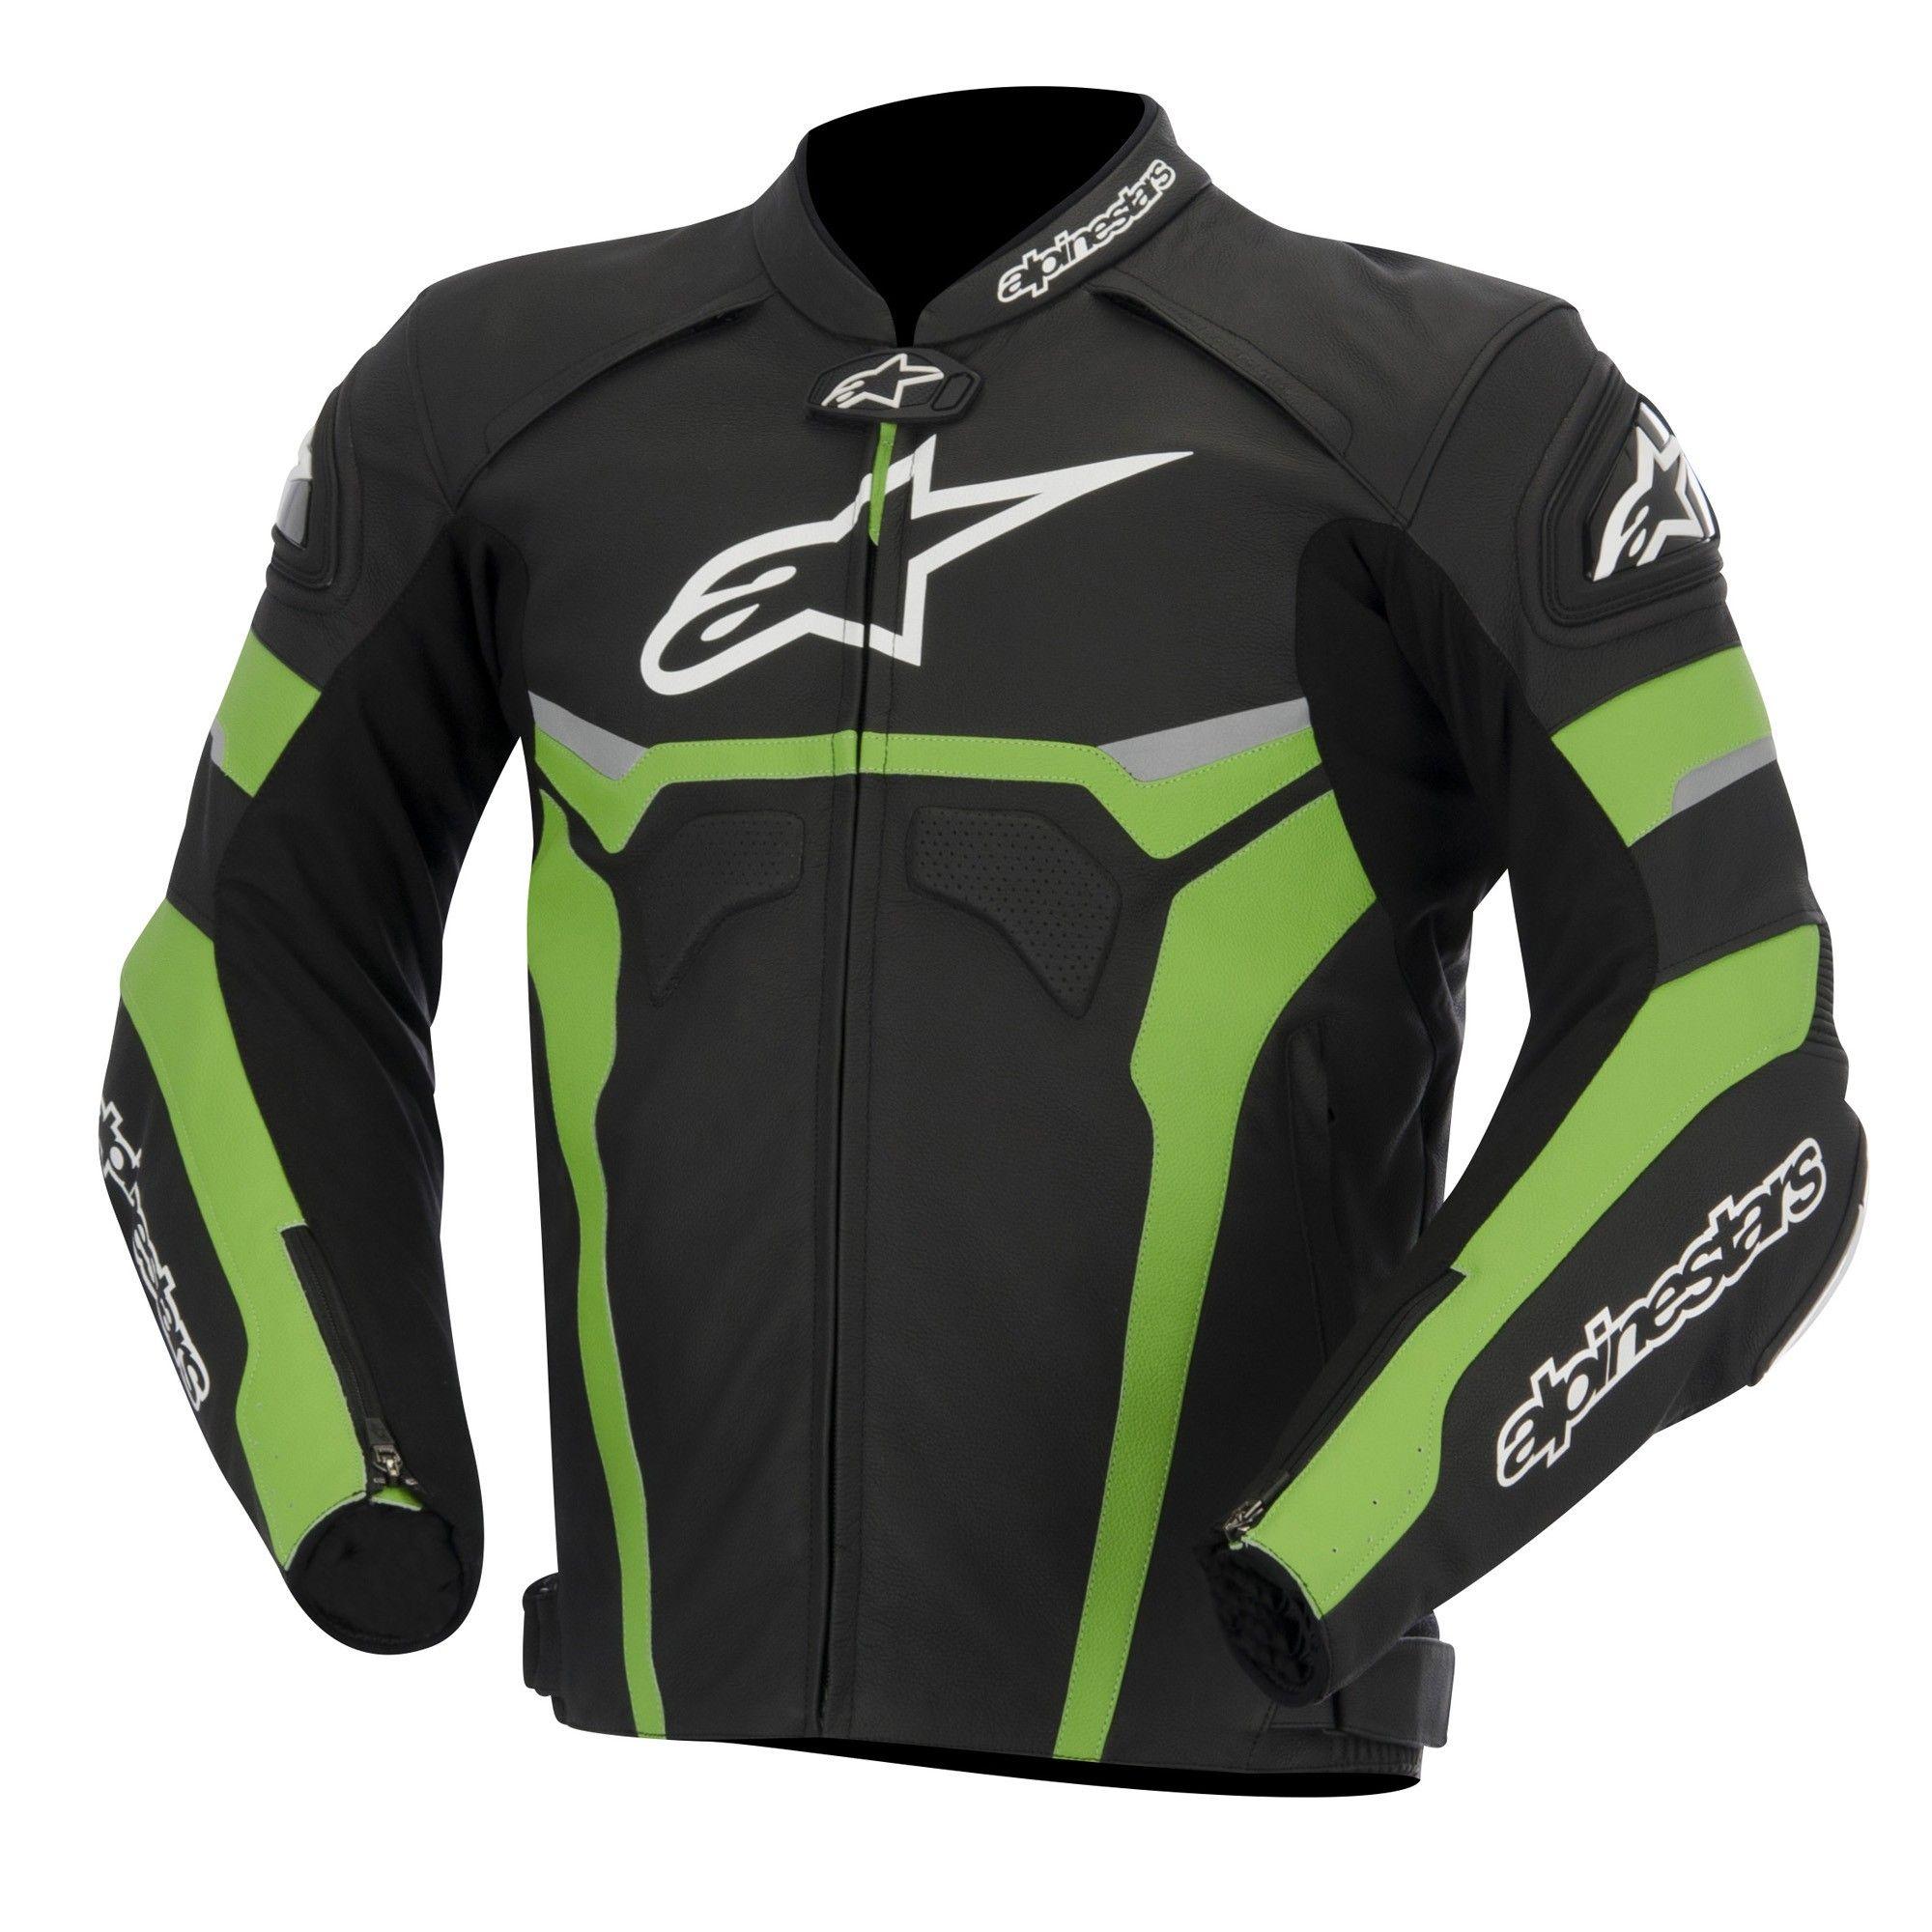 Celer Leather Jacket   Motorradbekleidung, Motorradjacke und